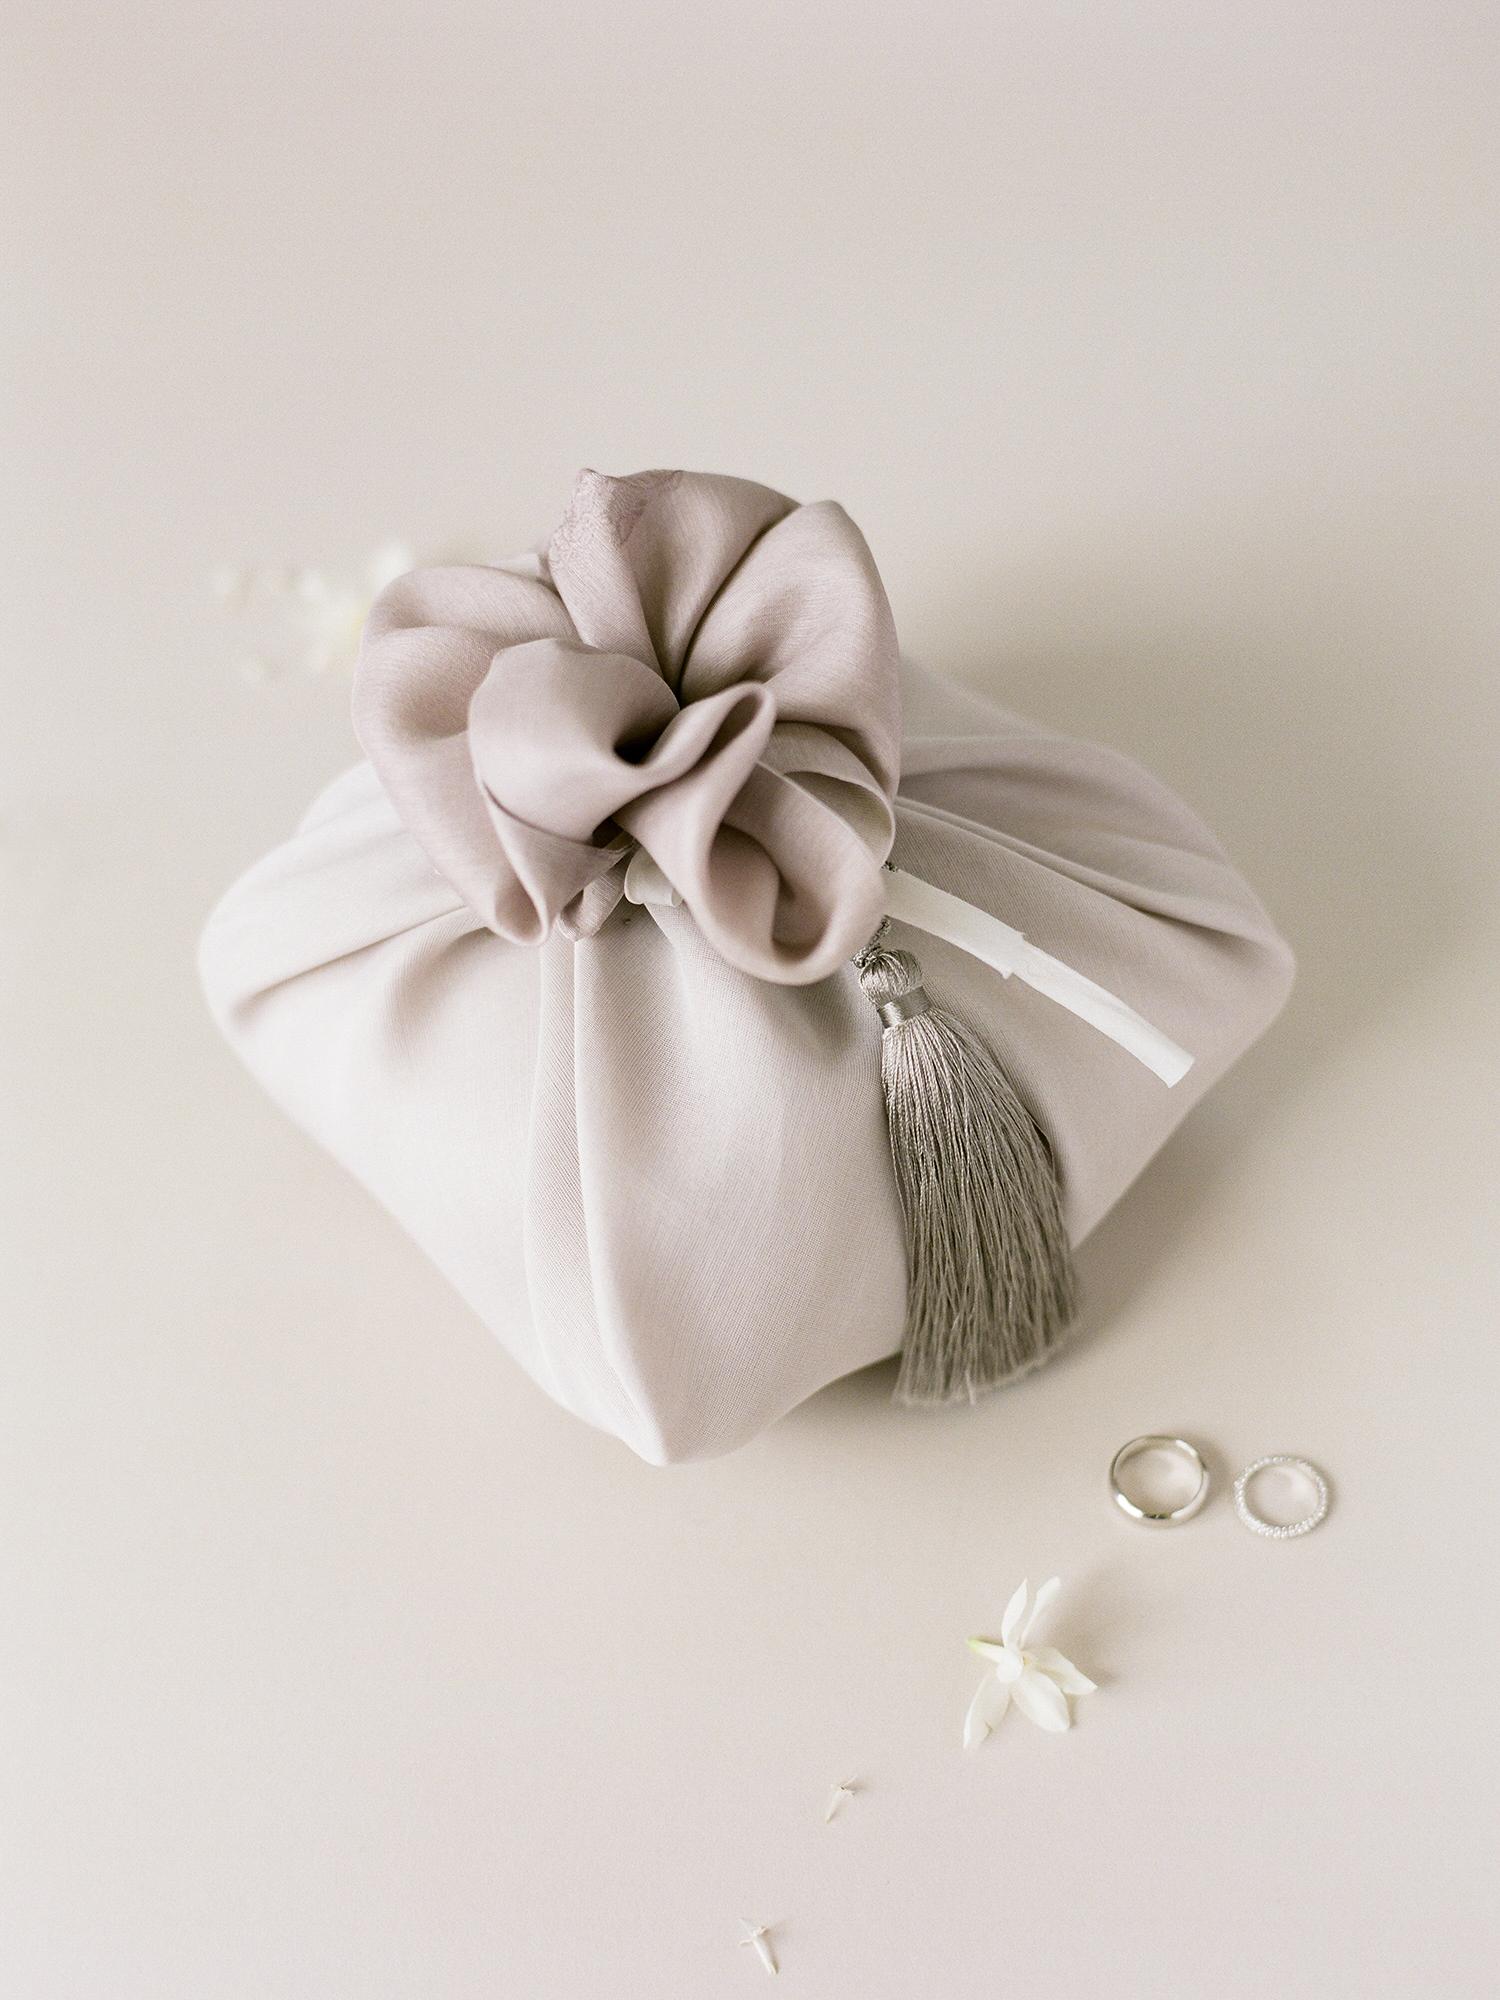 grace ceron wedding bundle and rings